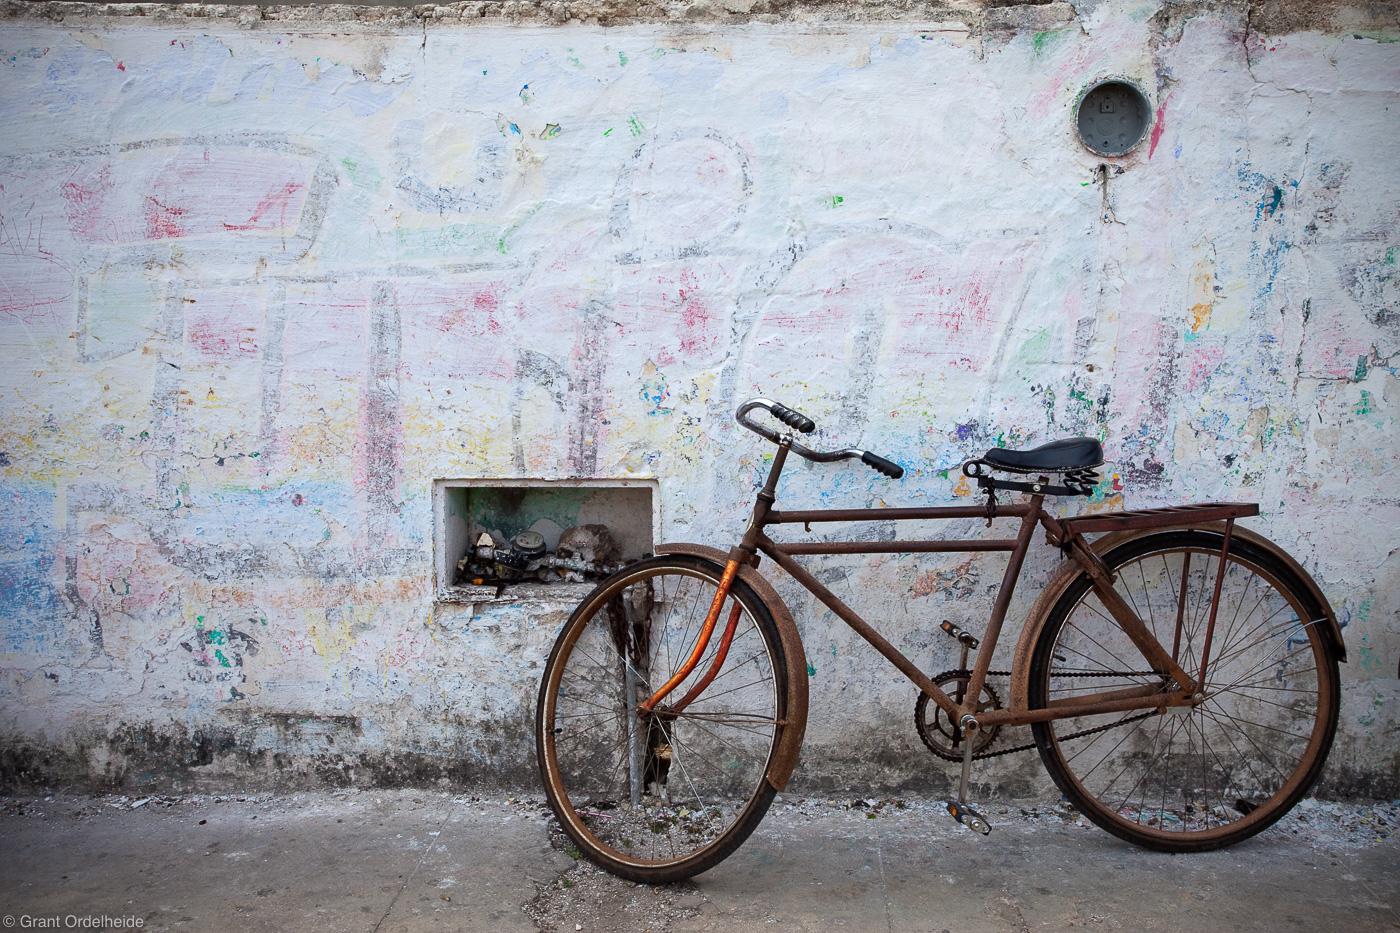 izamal, mexico, yucatan, old, rusty, bicycle, faded, wall, photo